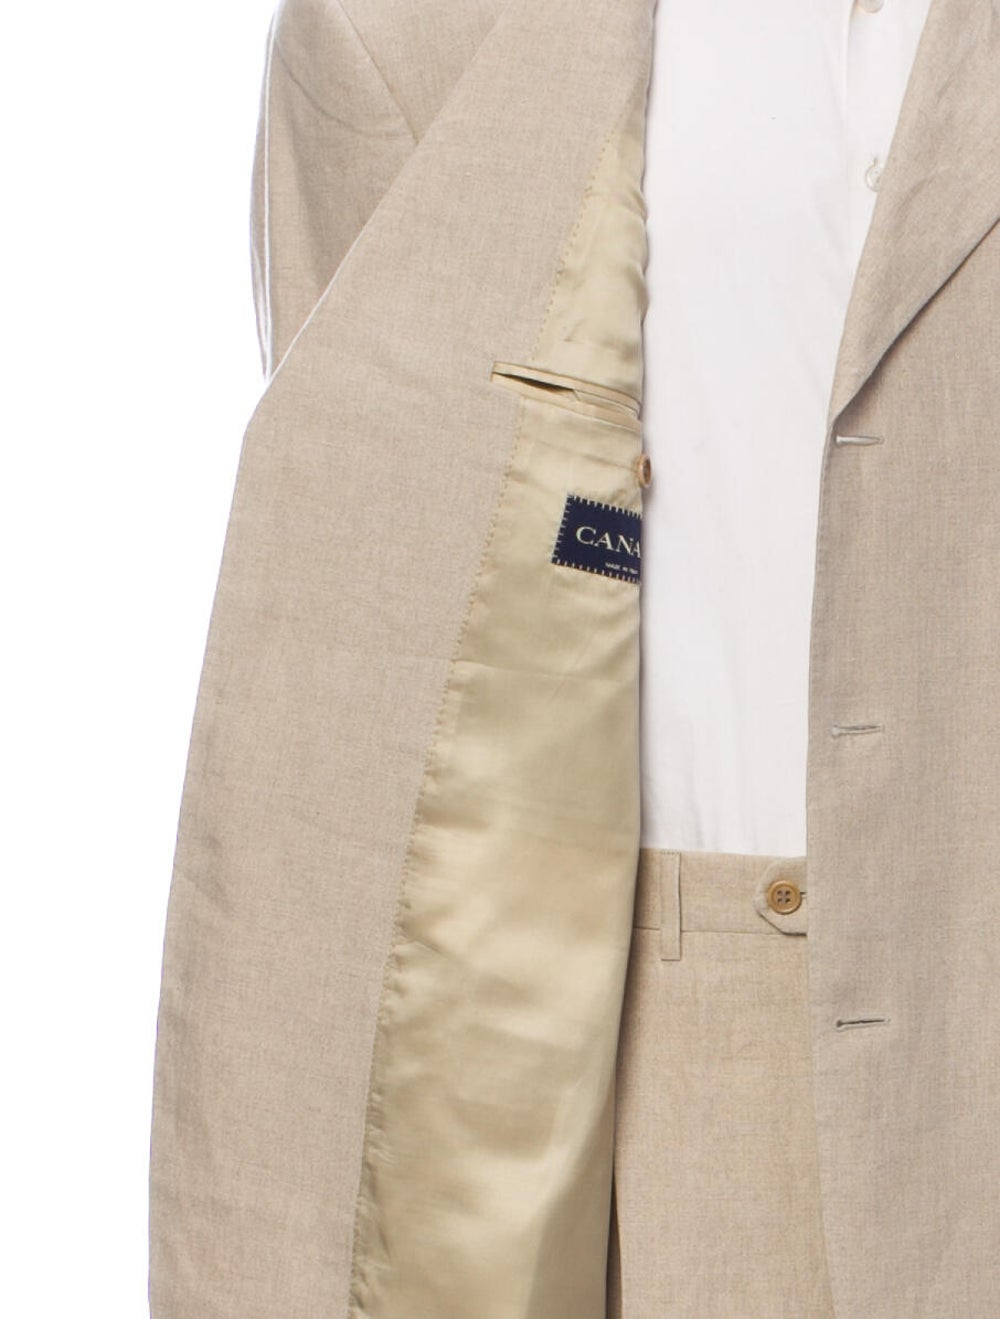 Canali Linen Two-Piece Suit - image 5